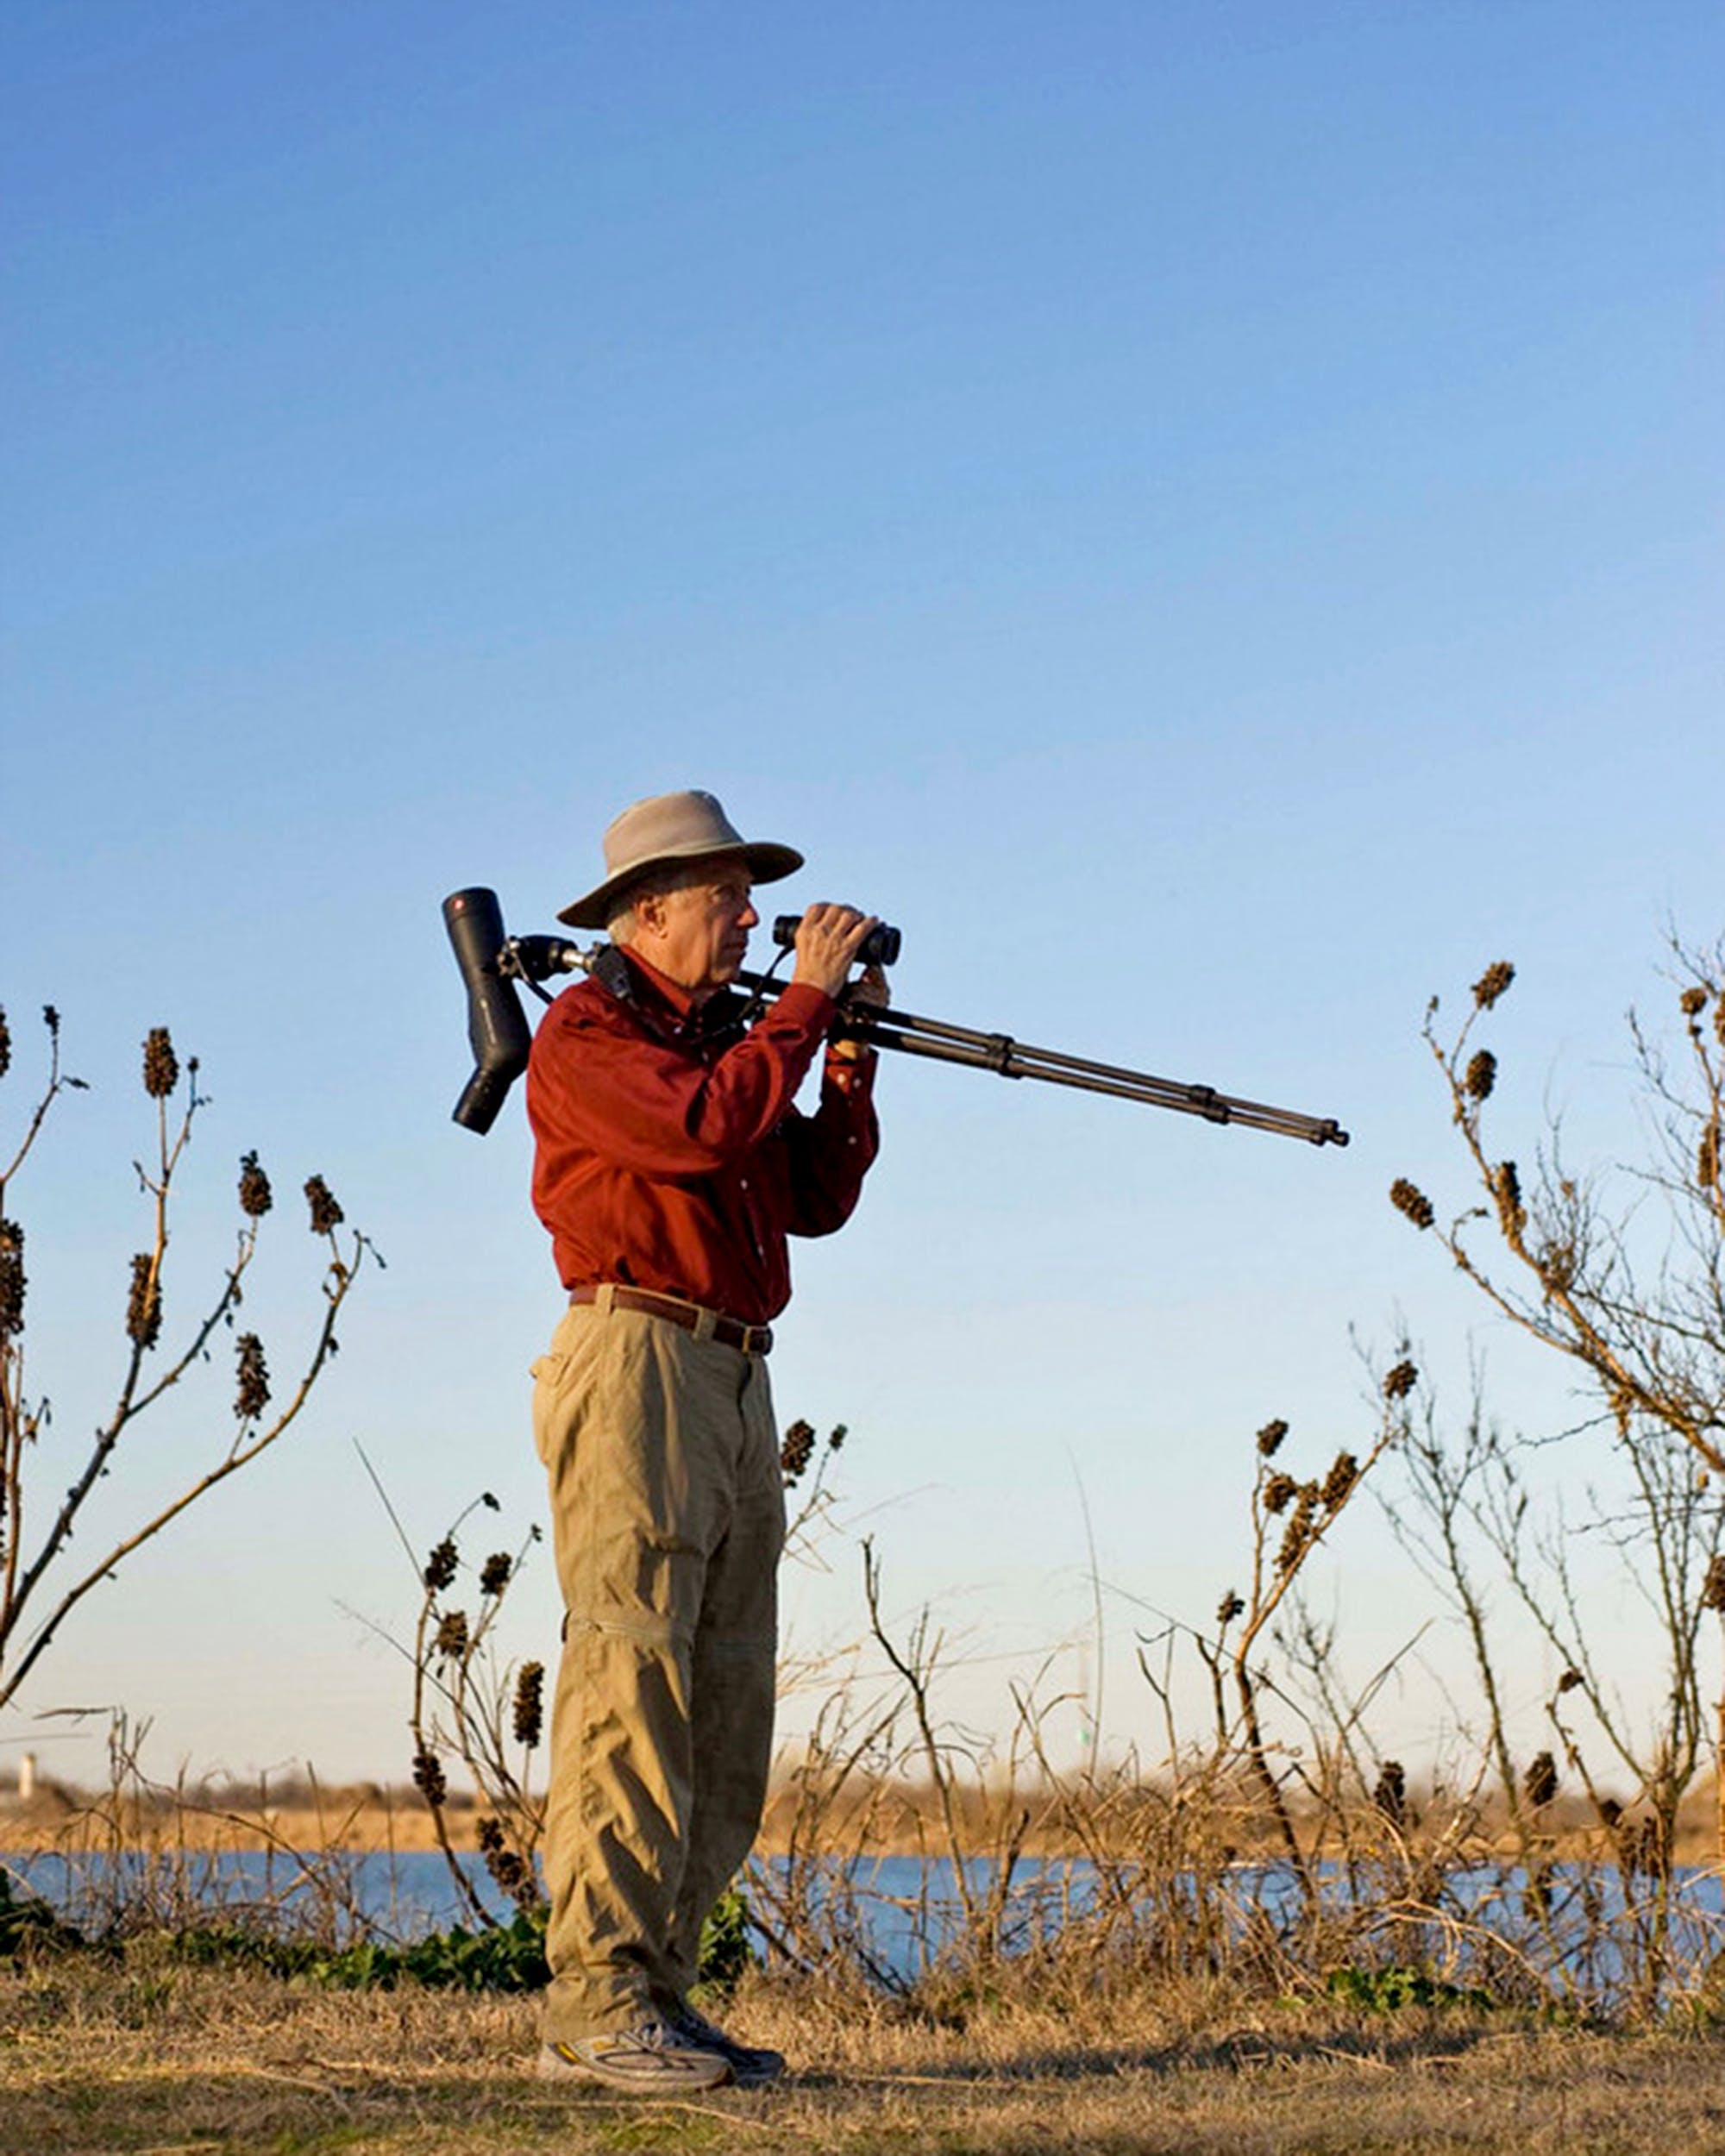 Emanuel-at-hornsby-bend-birdman-of-texas